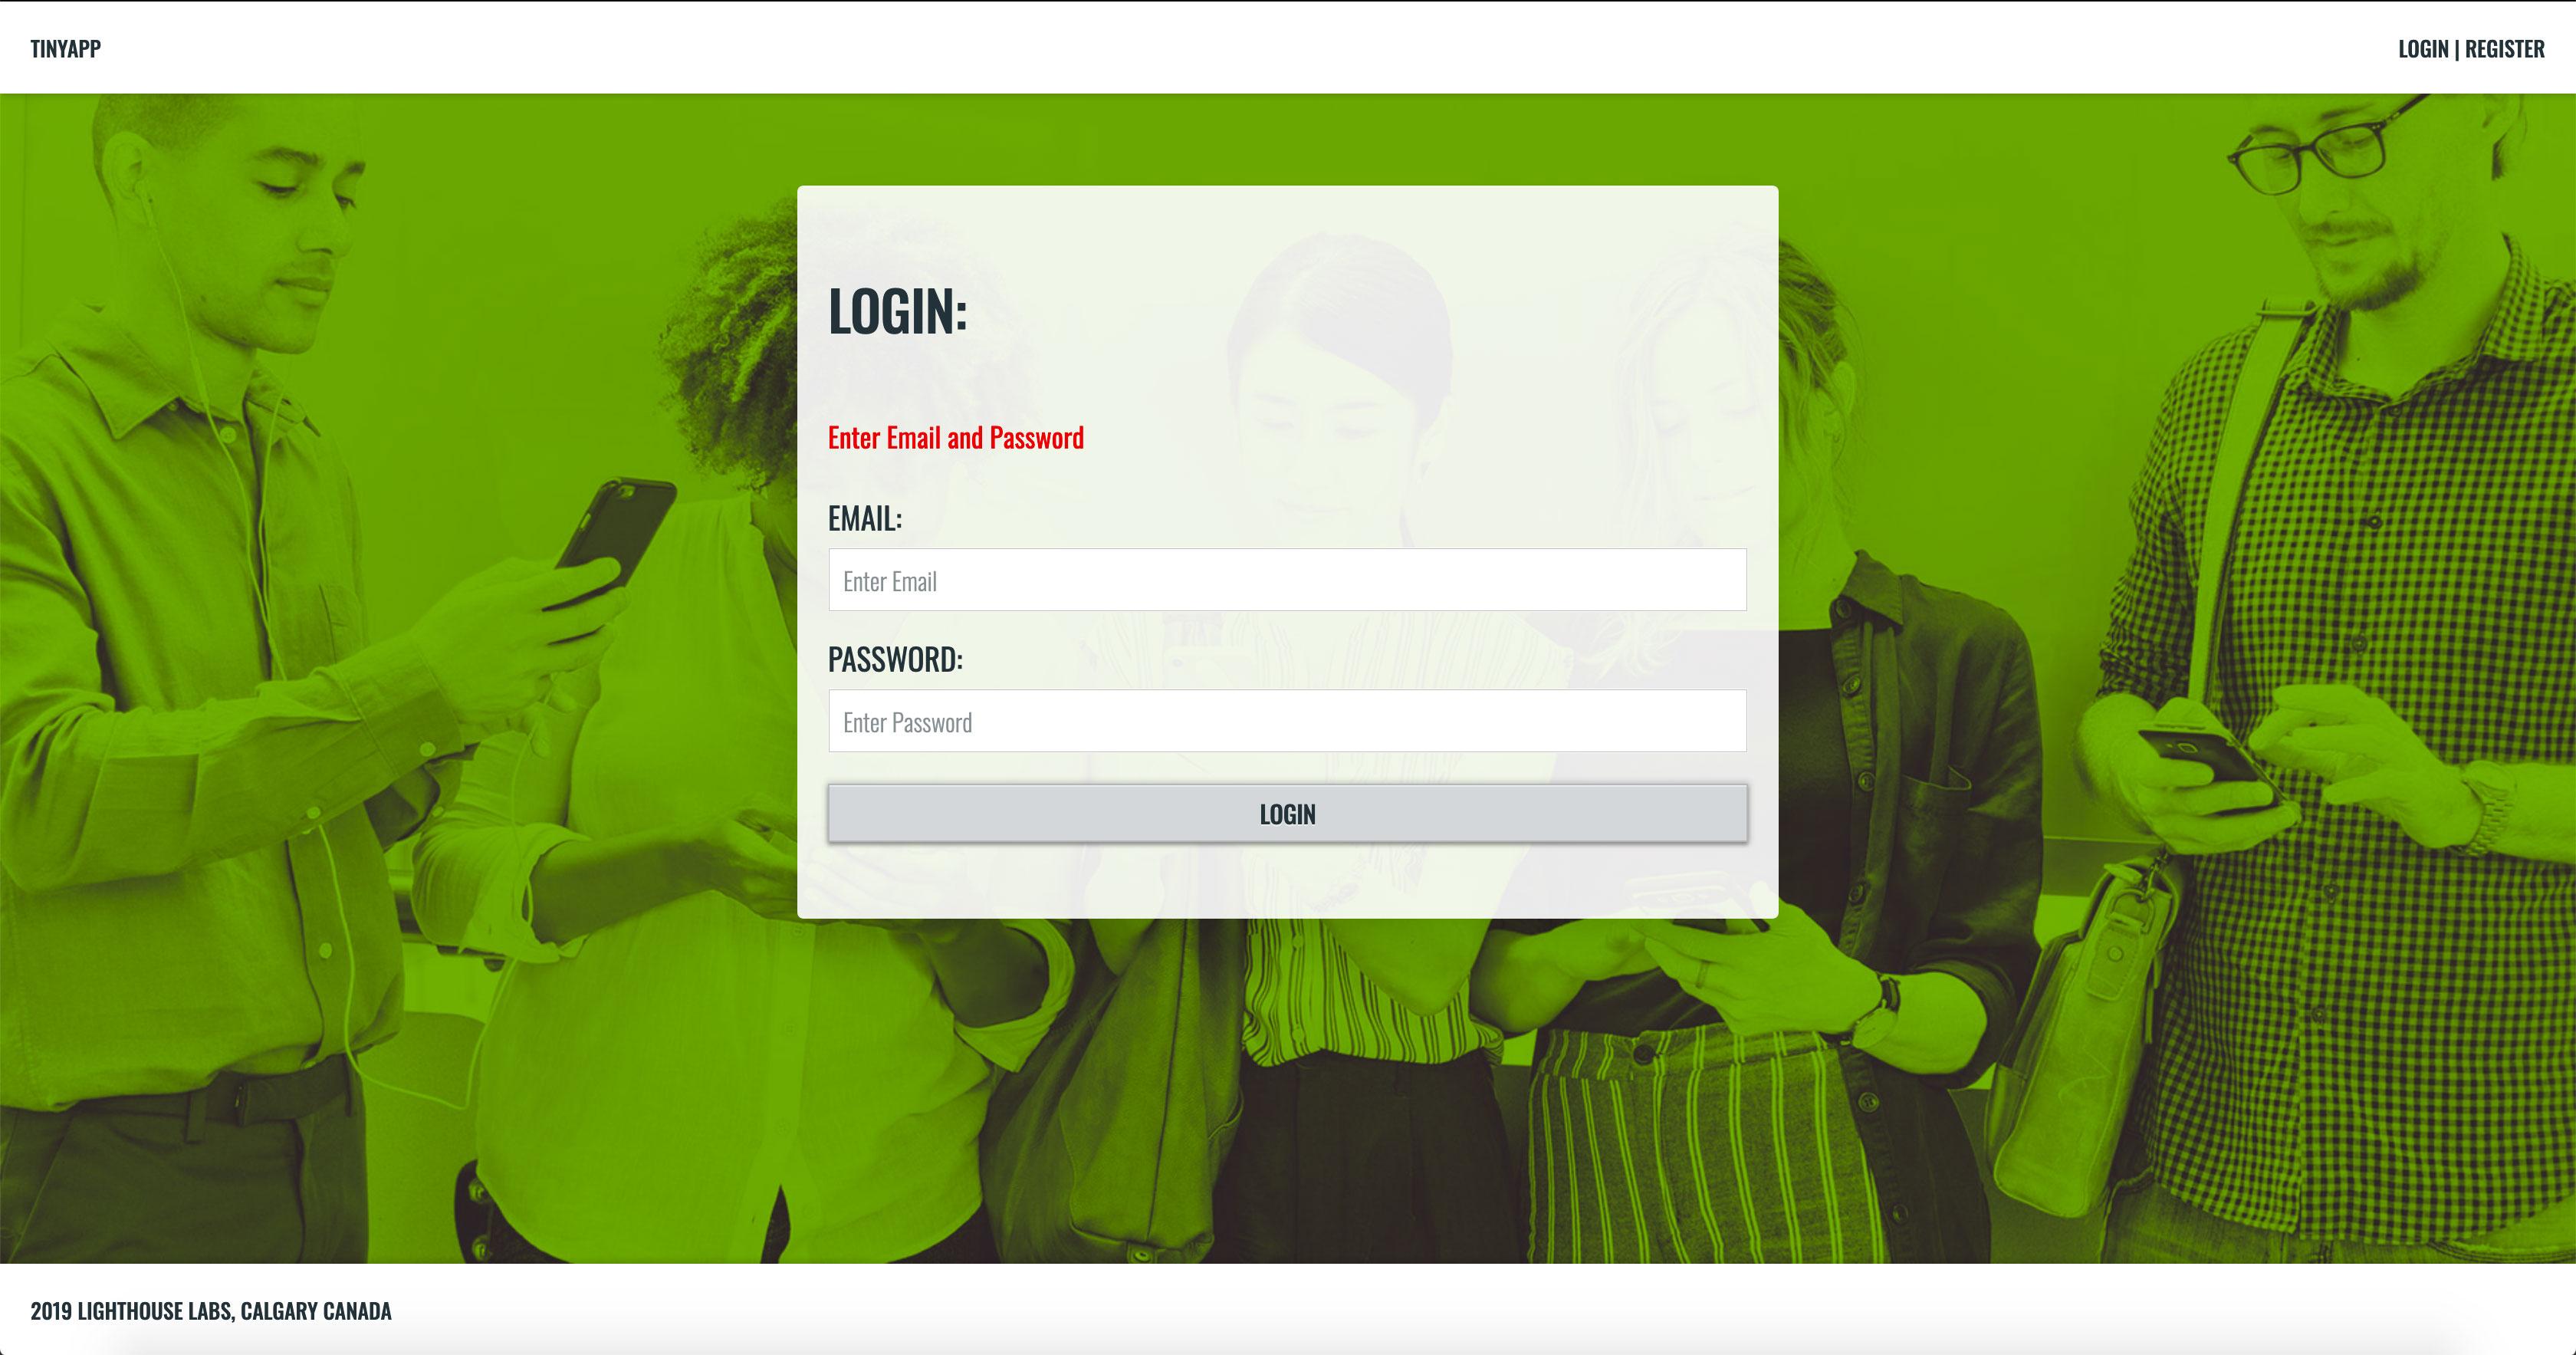 TinyApp Login Page - Error Message